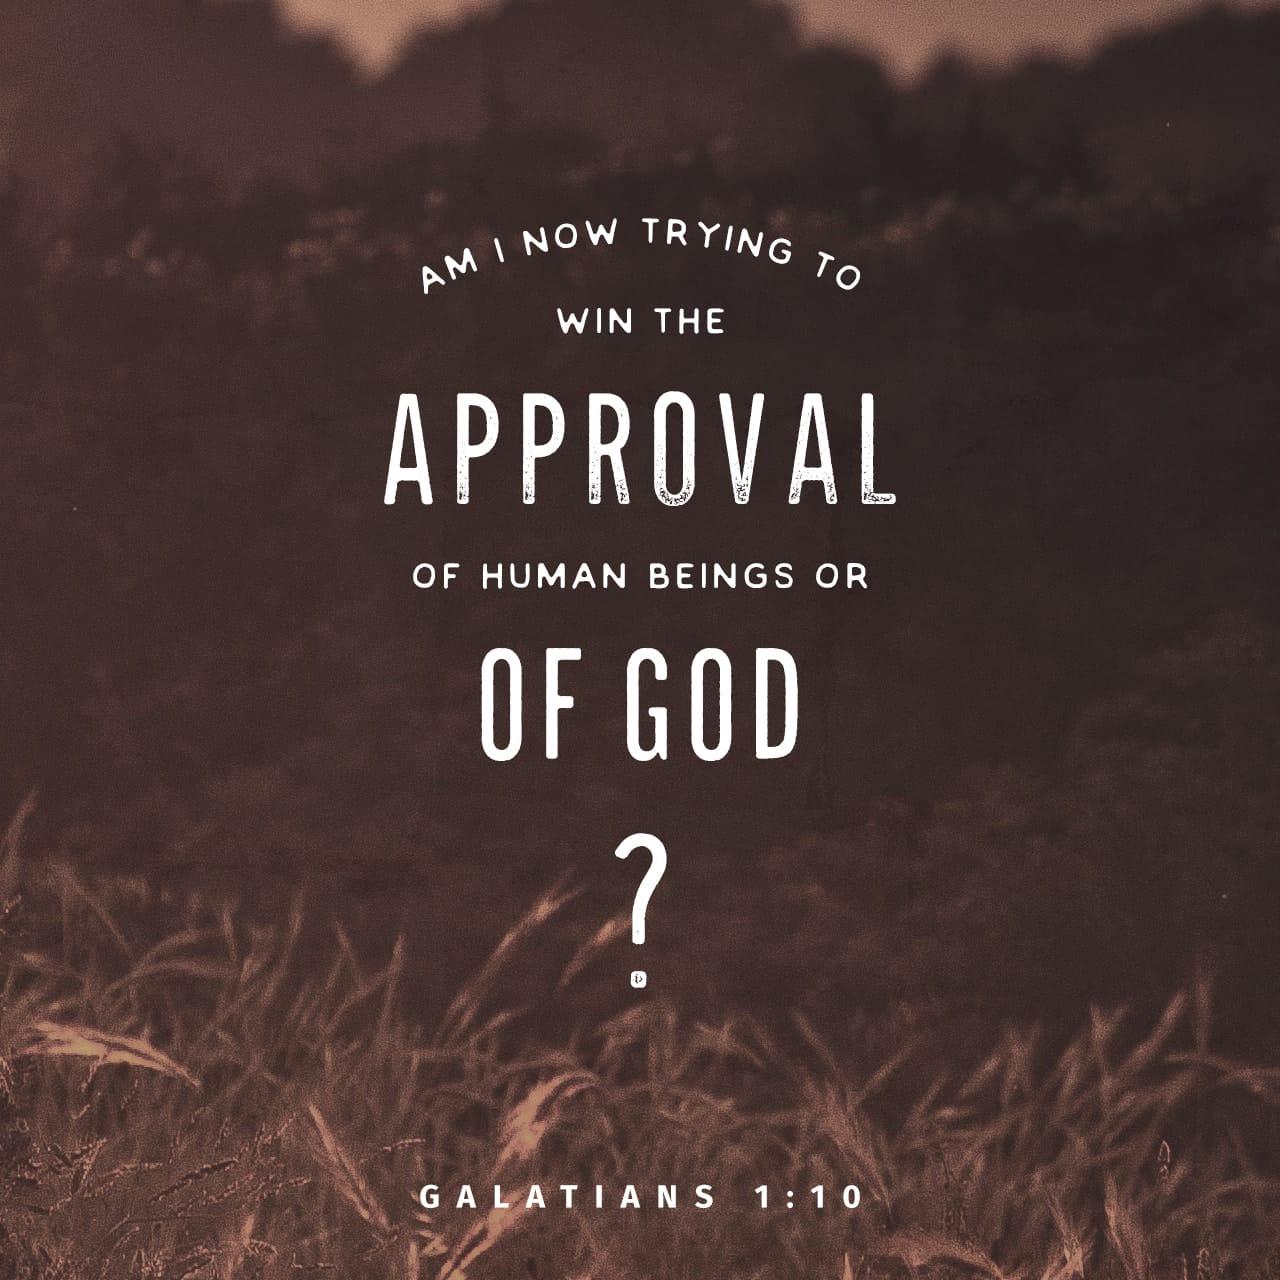 Galatians 1:10 For do I now persuade men, or God? or do I seek to please men? for if I yet pleased men, I should not be the servant of Christ. | King James Version (KJV)